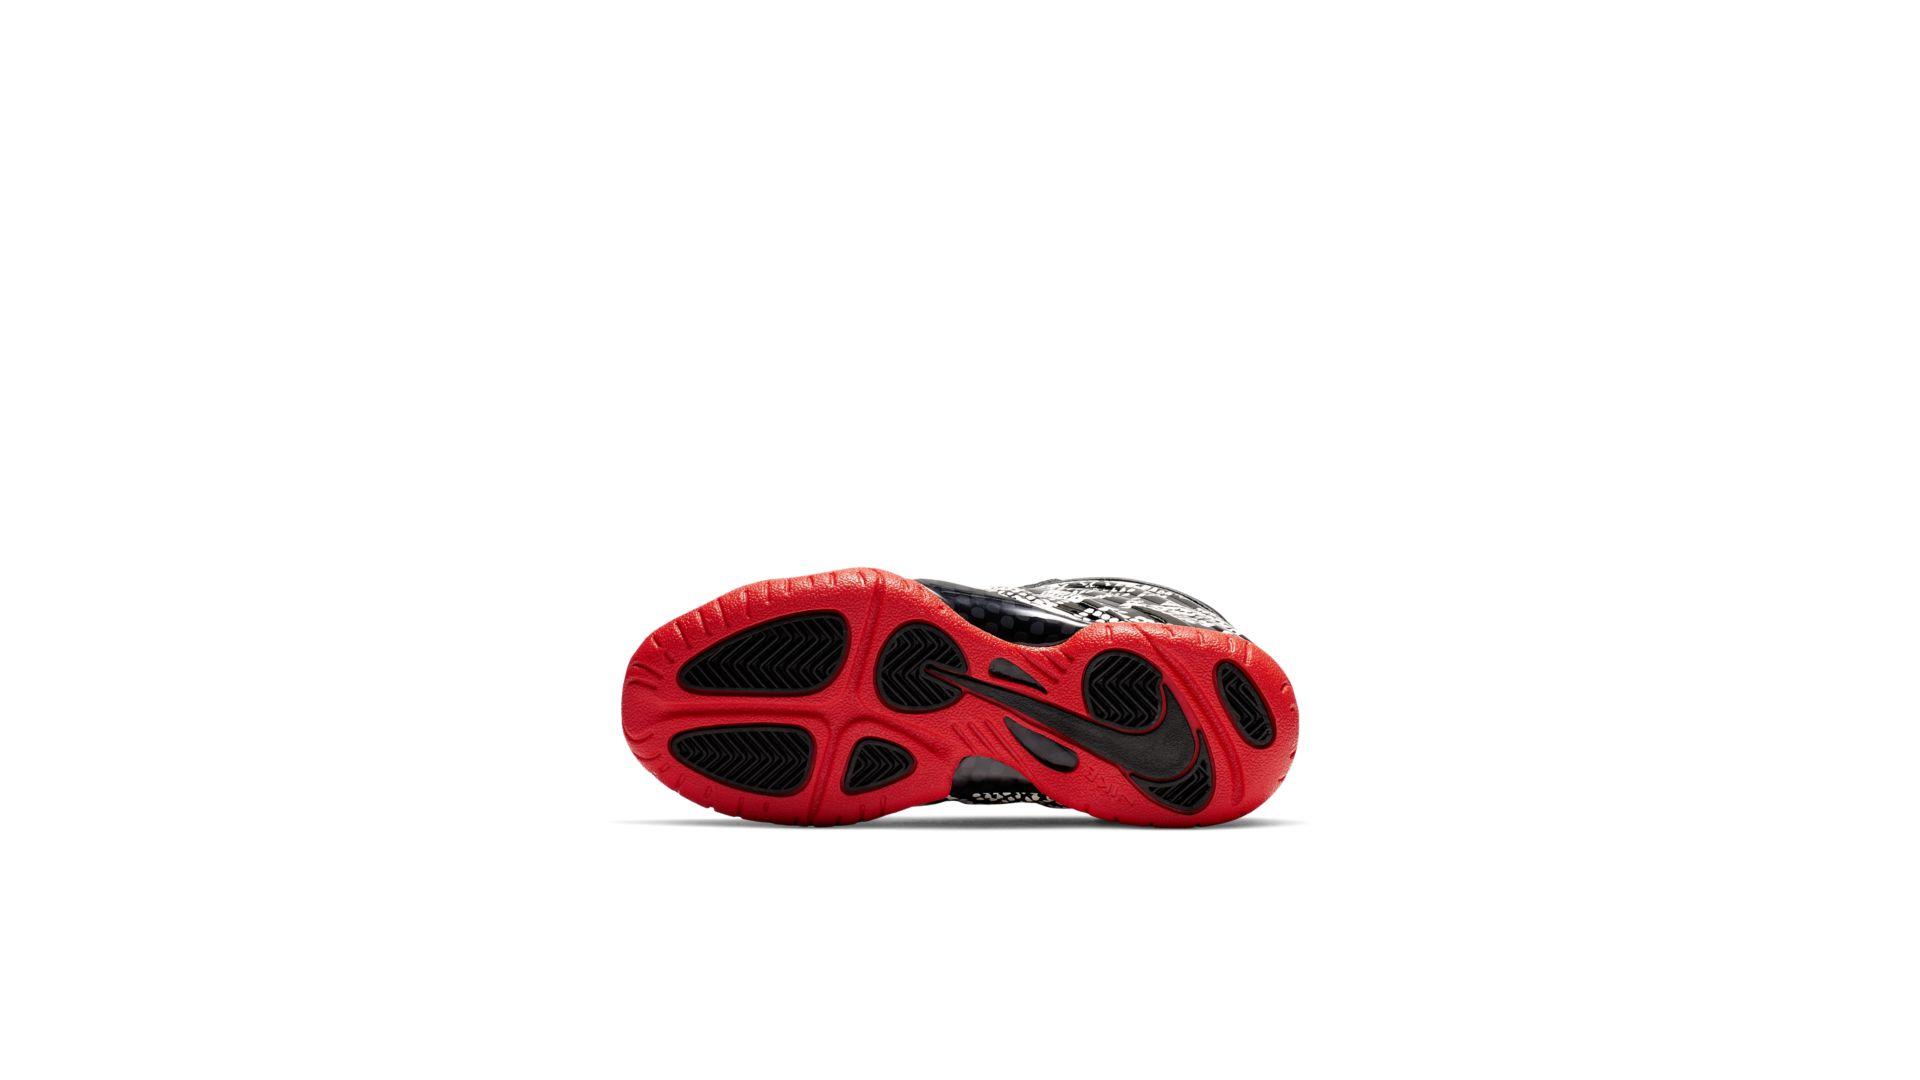 Nike Air Foamposite One Albino Snakeskin (PS) (723946-104)